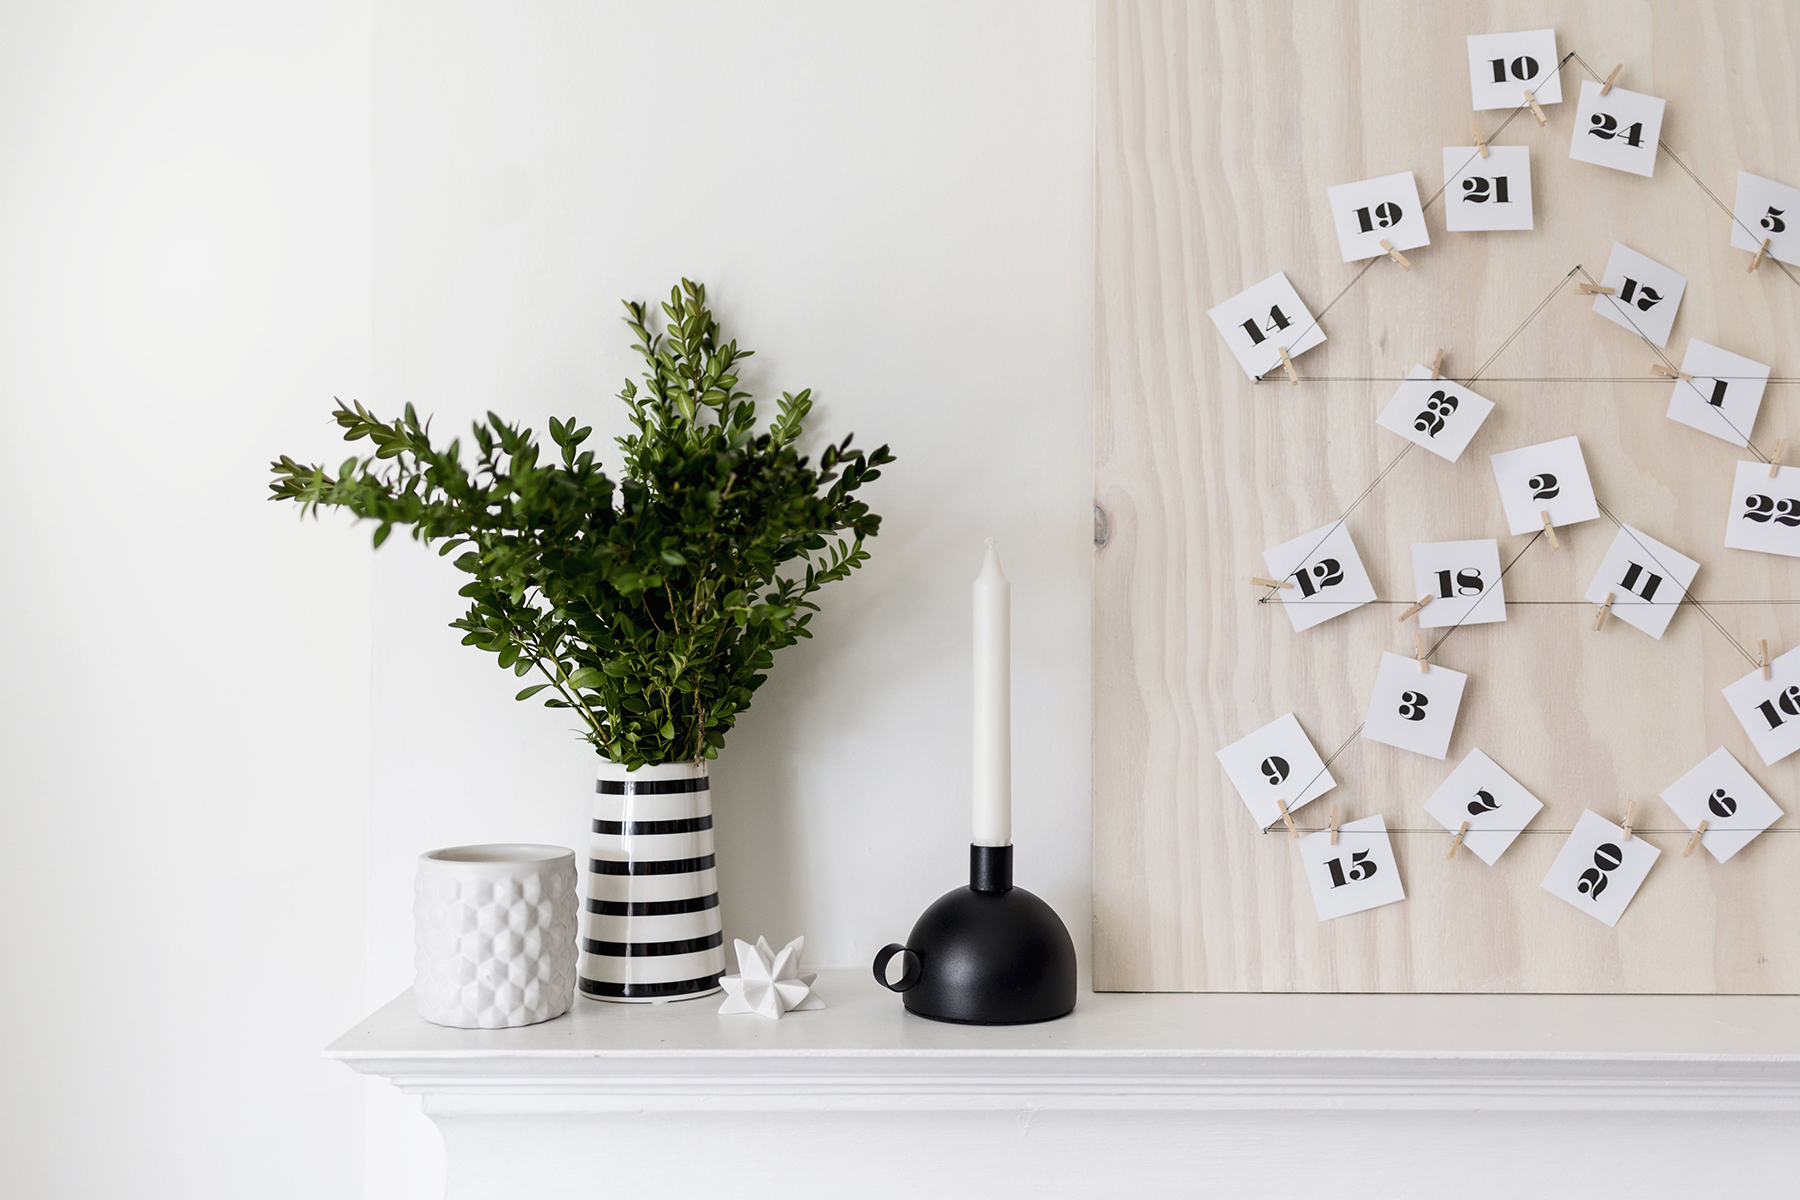 Diy Modern, Scandinavian Advent Calendar With Free Printable | Happy throughout Free Printable Blank Advent Activities List Minimal